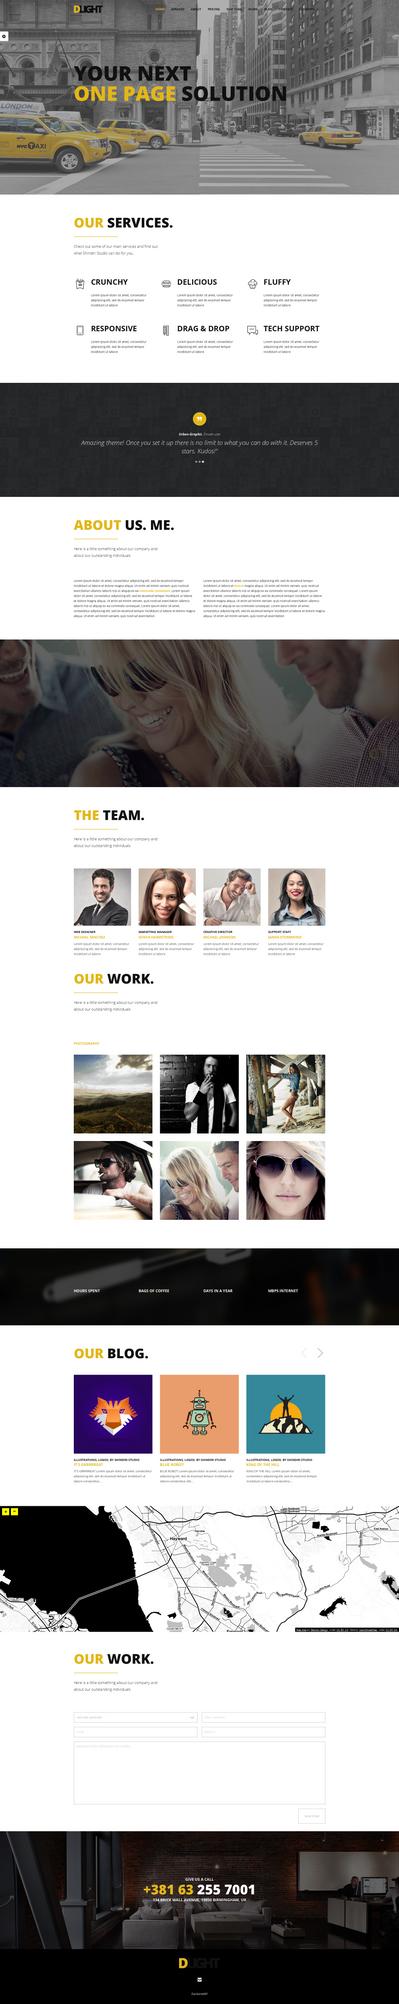 D-light One Page Wordpress Website - Light version by ShindiriStudio